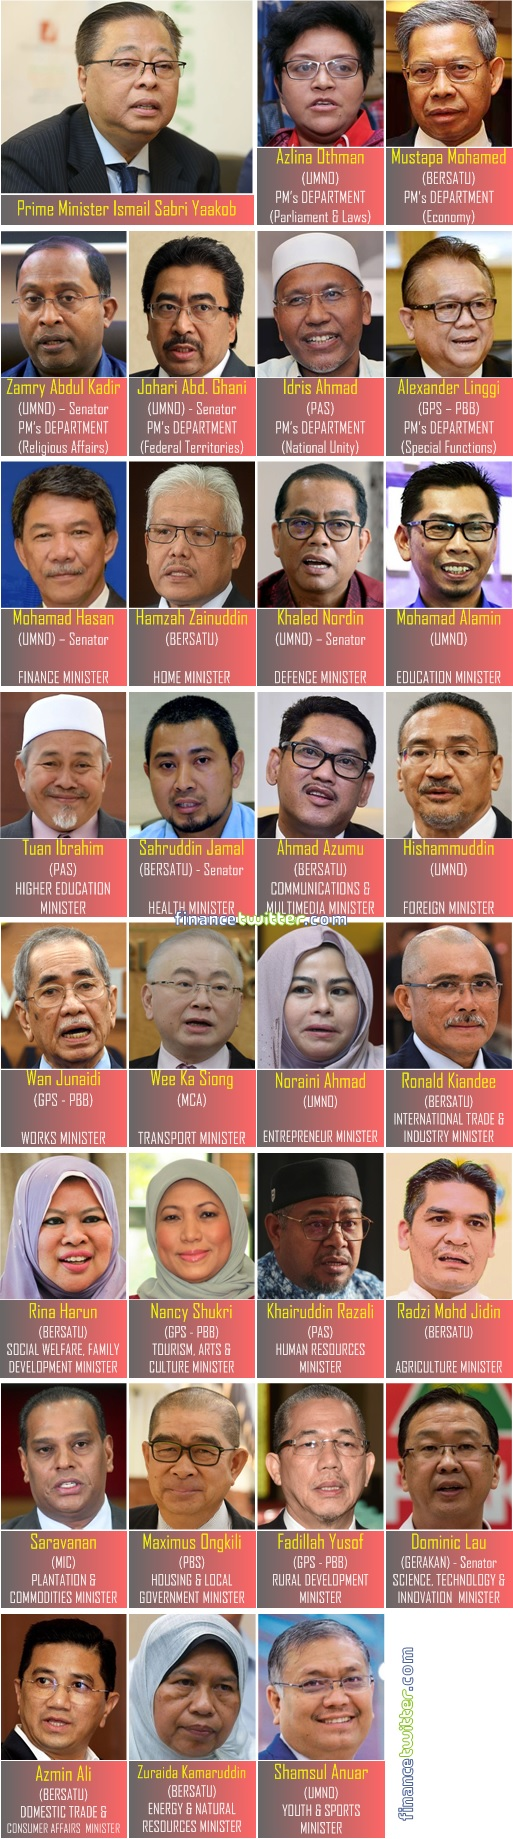 Prime Minister Ismail Sabri Cabinet List - Leaked